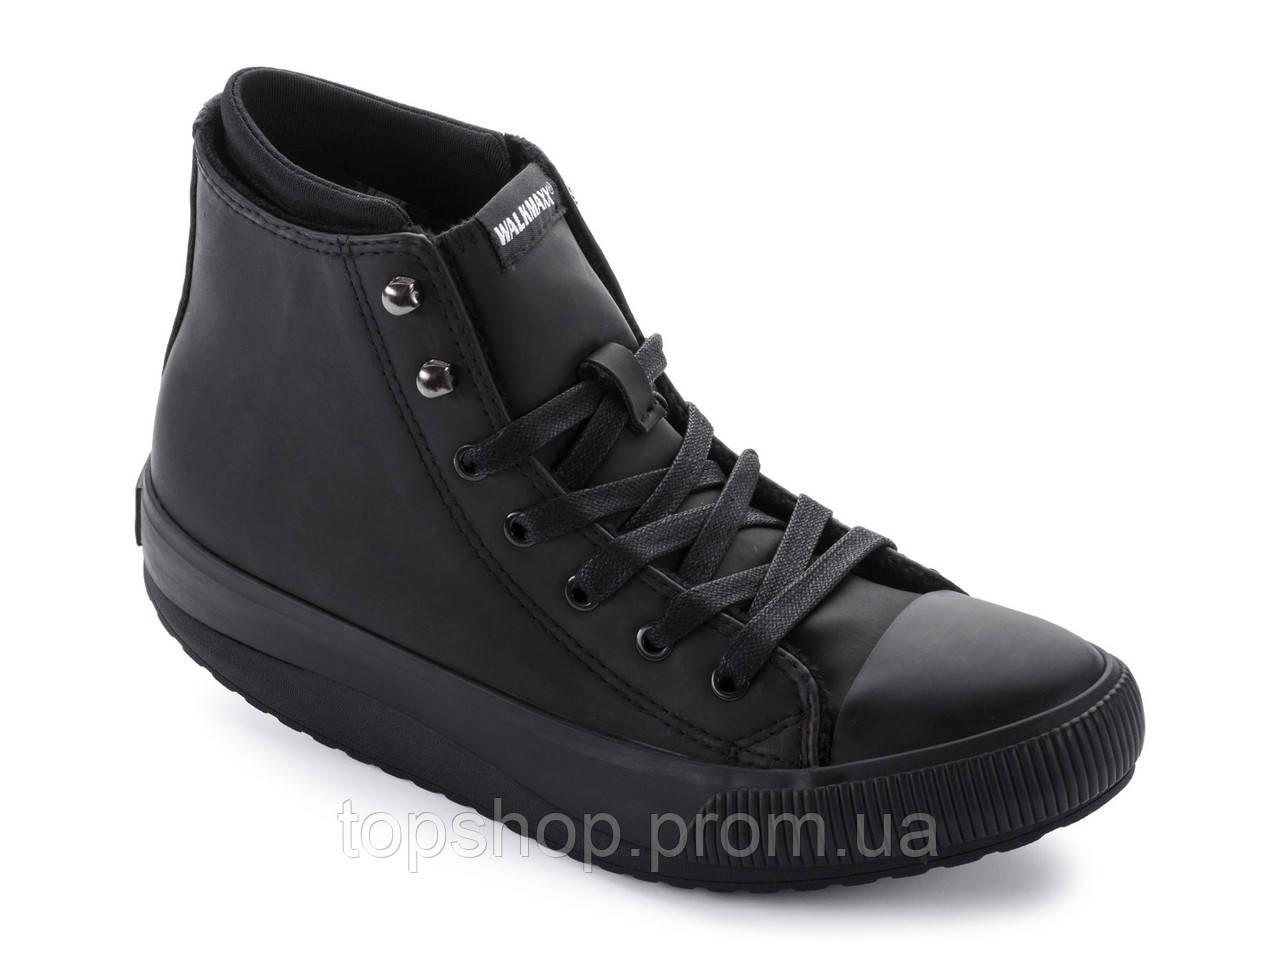 e1a86352 Кеды высокие Walkmaxx Comfort 3.0 40 Длина стопы 26,5 см Серый - TopShop -